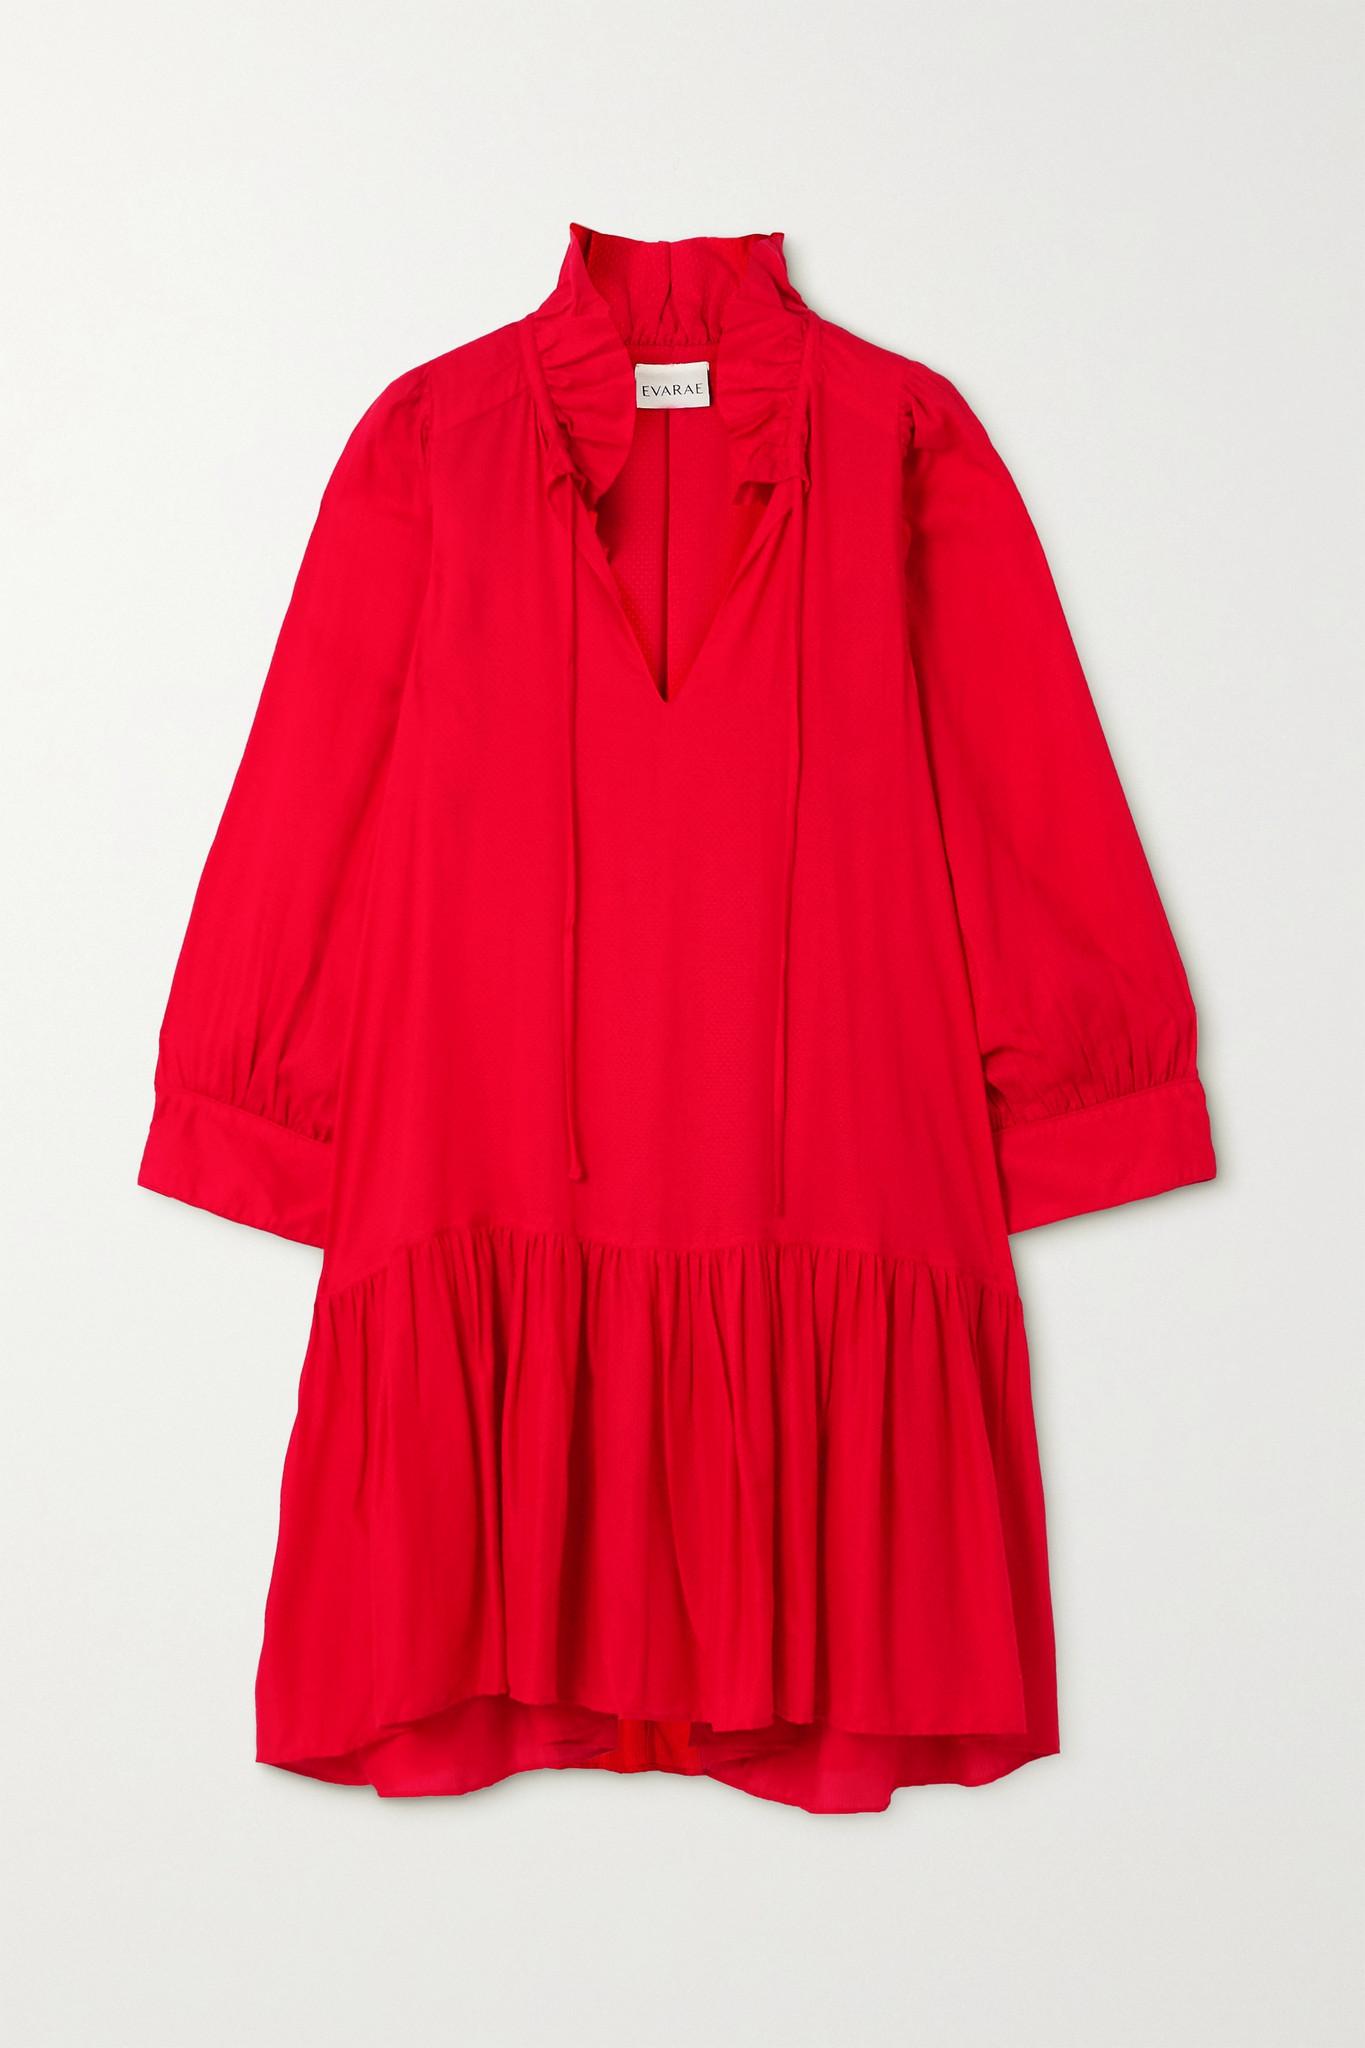 EVARAE - 【net Sustain】marais 荷叶边天丝莱赛尔纤维迷你连衣裙 - 红色 - large